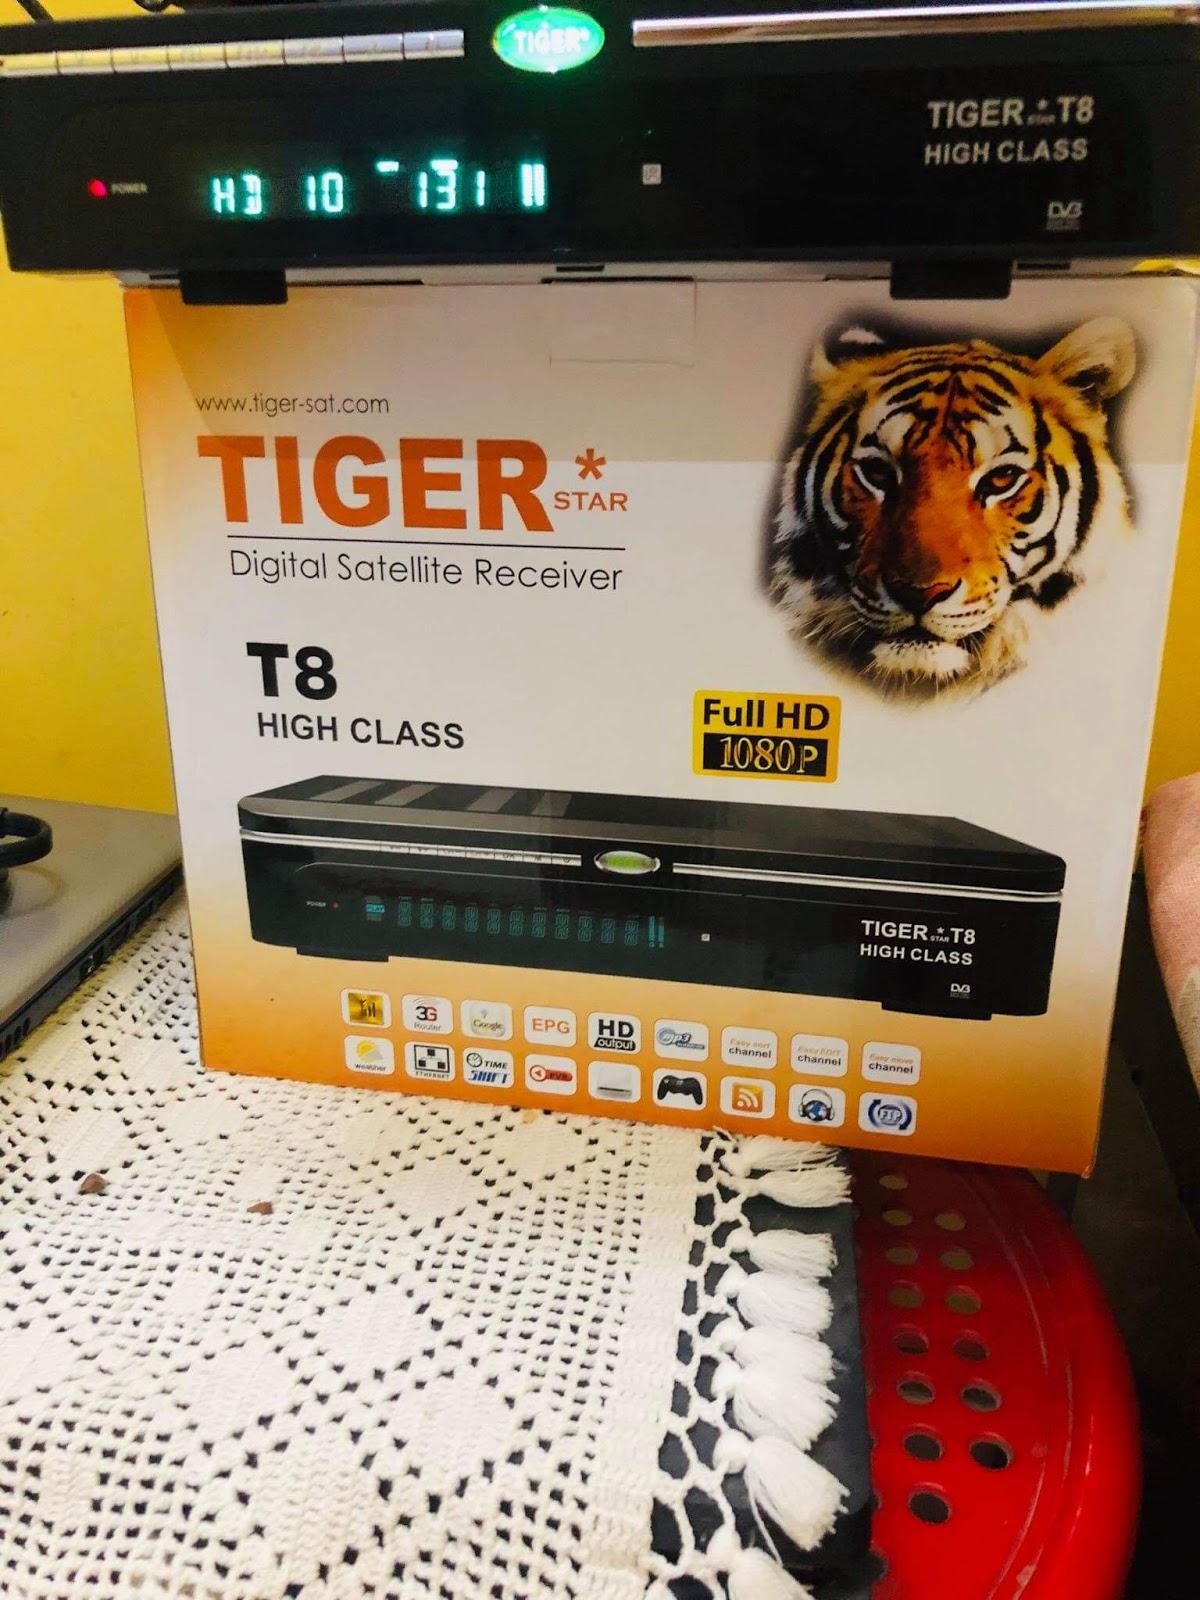 TIGER T8 HIGH CLASS HD RECEIVER, AUTO ROLL POWERVU KEY NEW